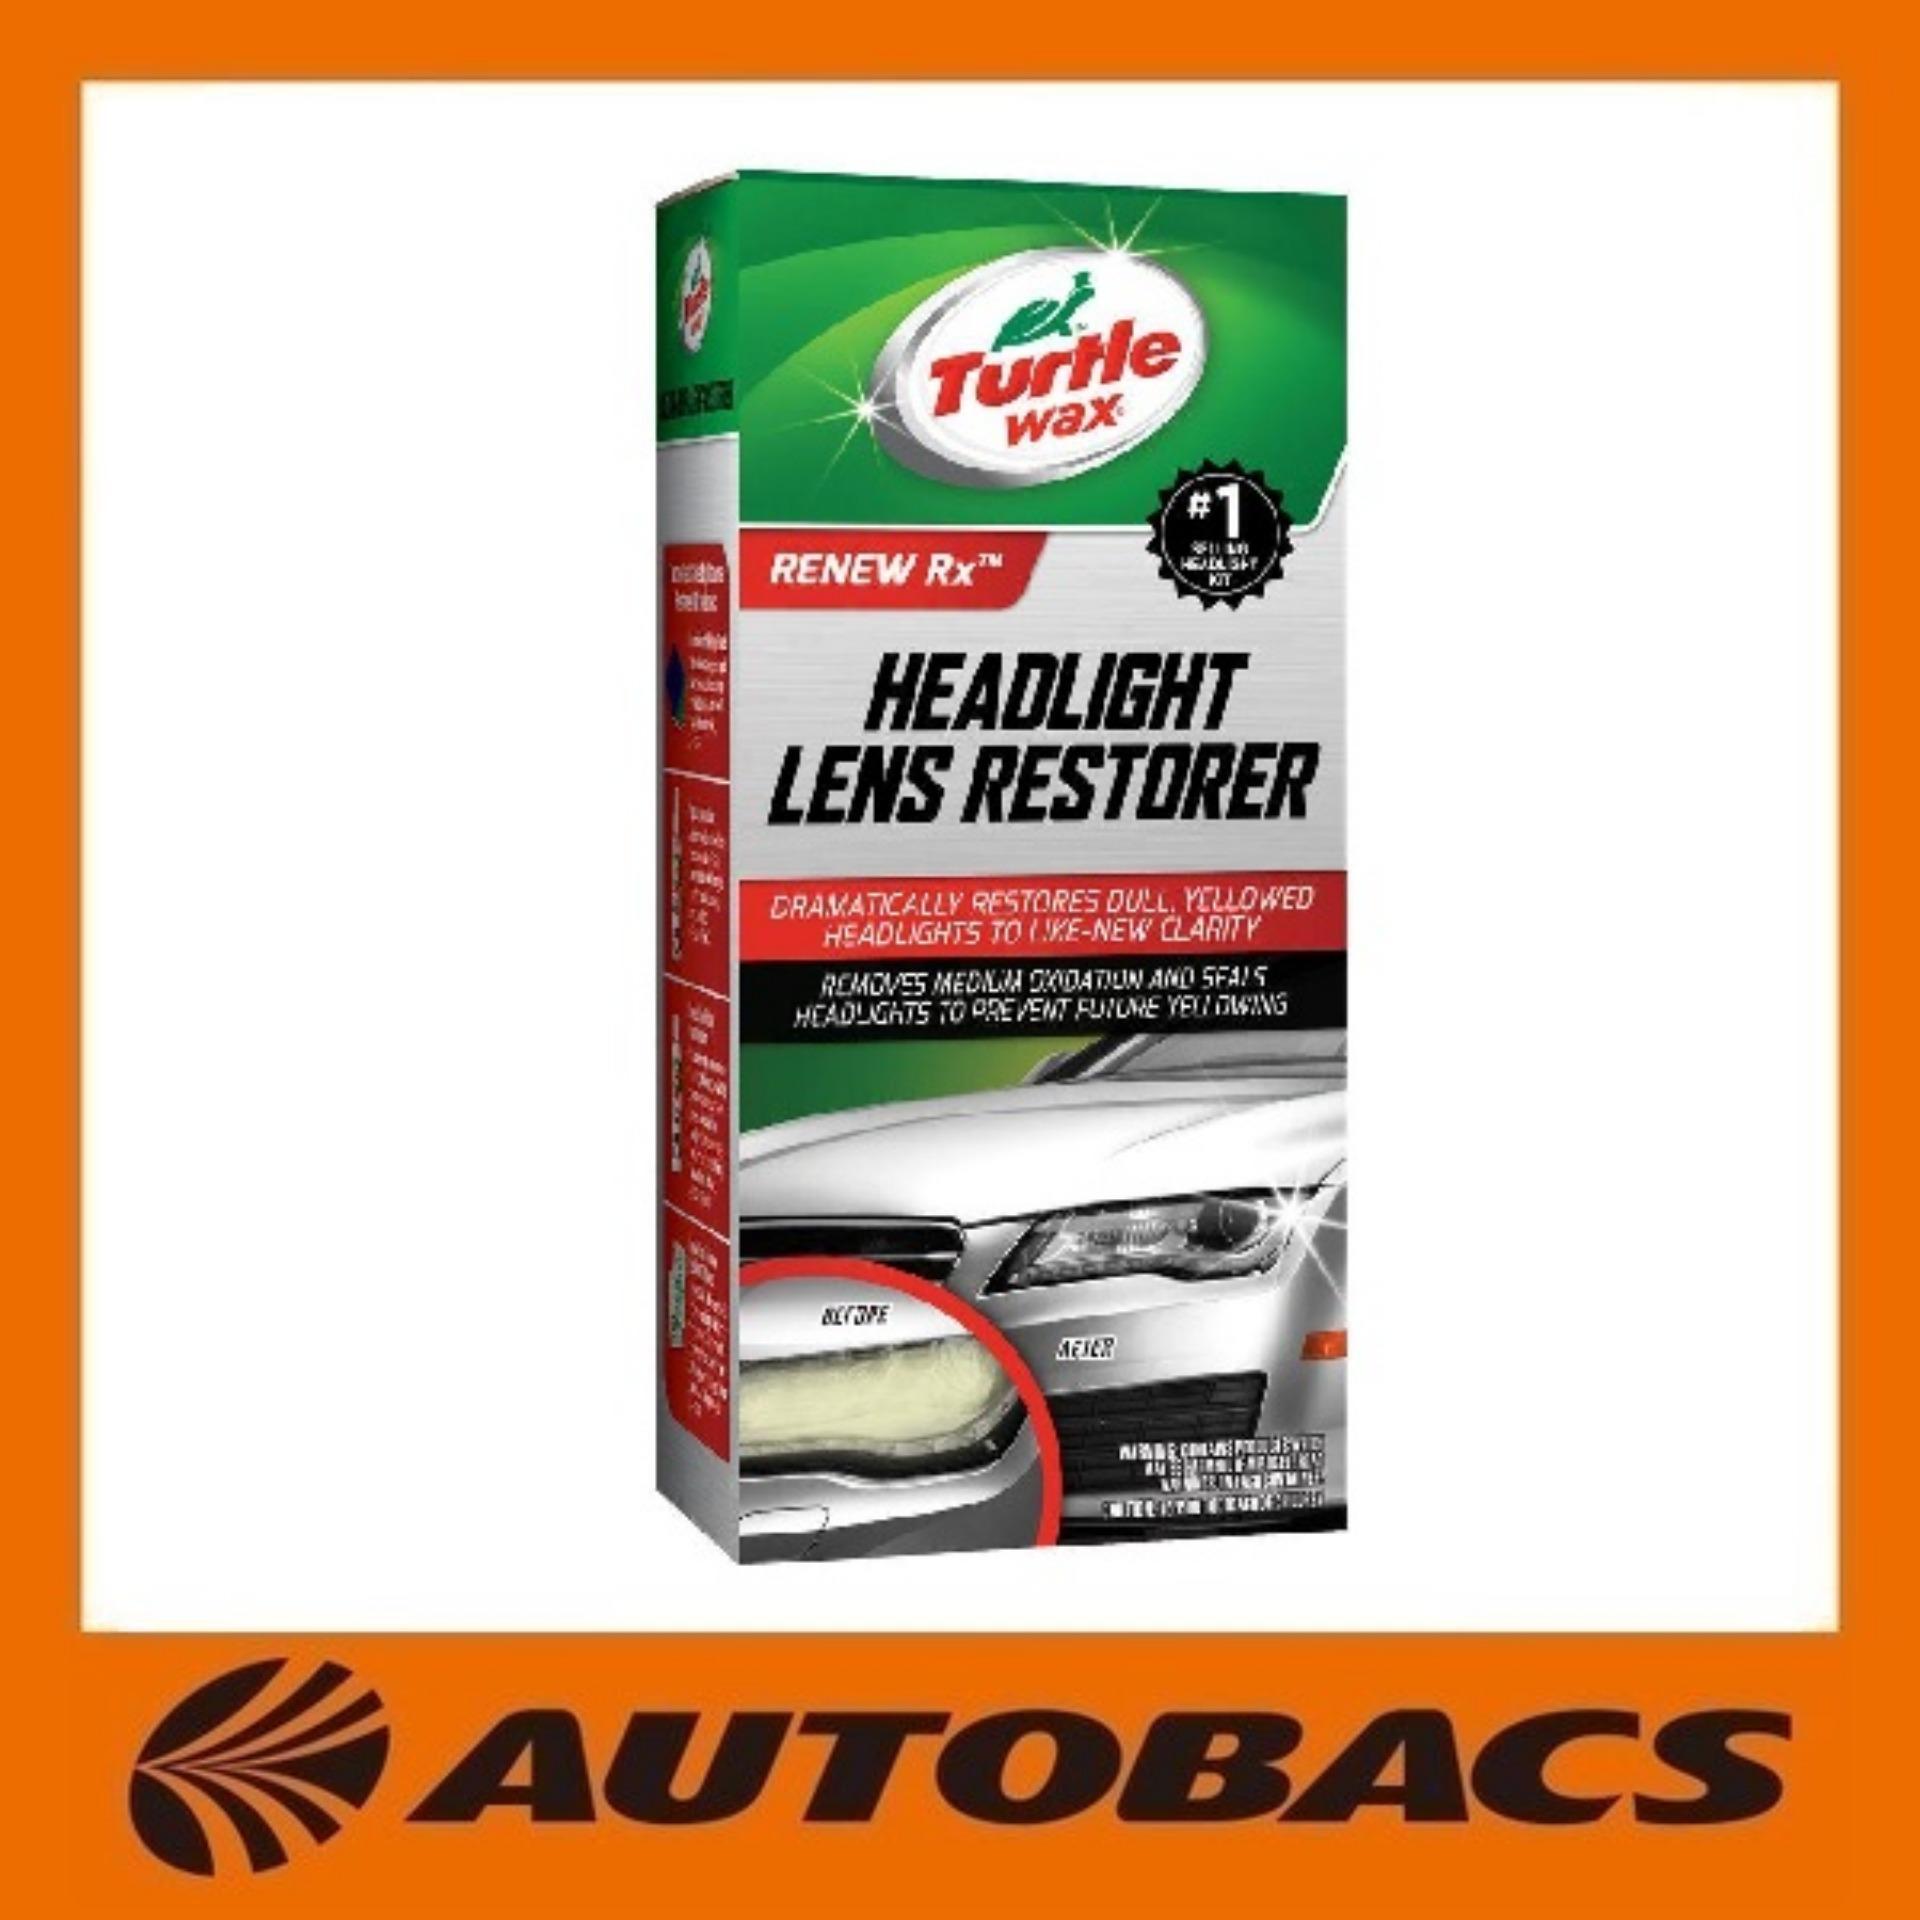 Top Rated Turtle 1066233800007 Headlight Lens Restorer Kit